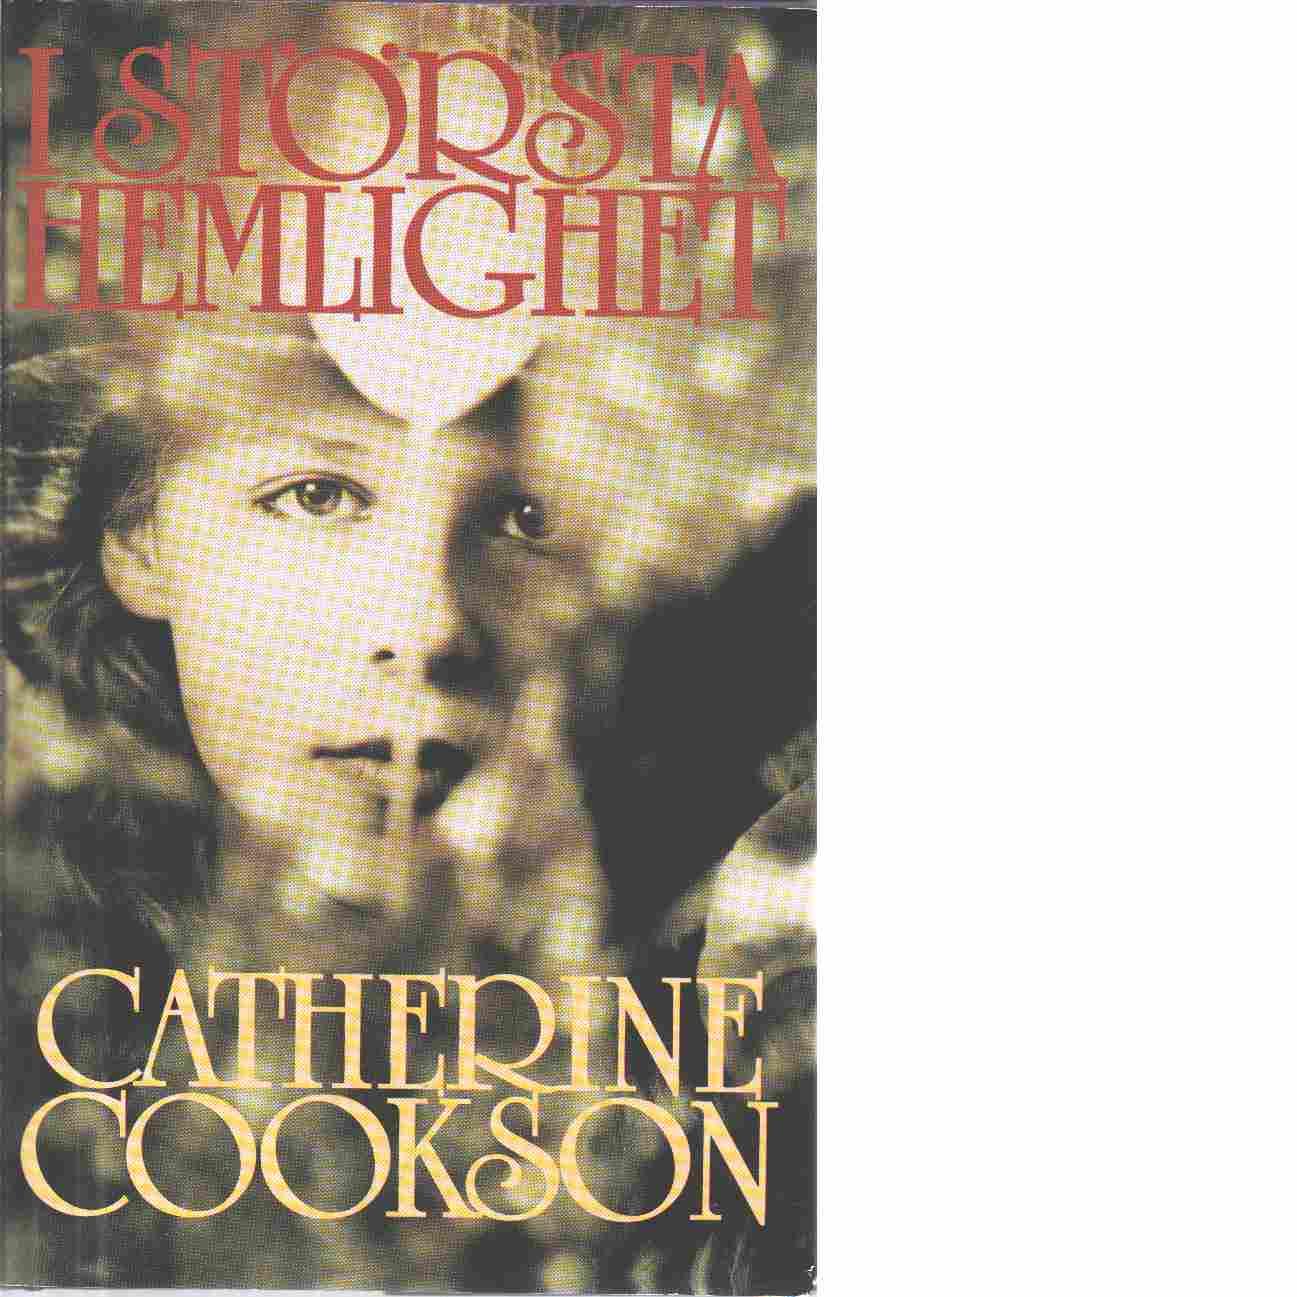 I största hemlighet - Cookson, Catherine